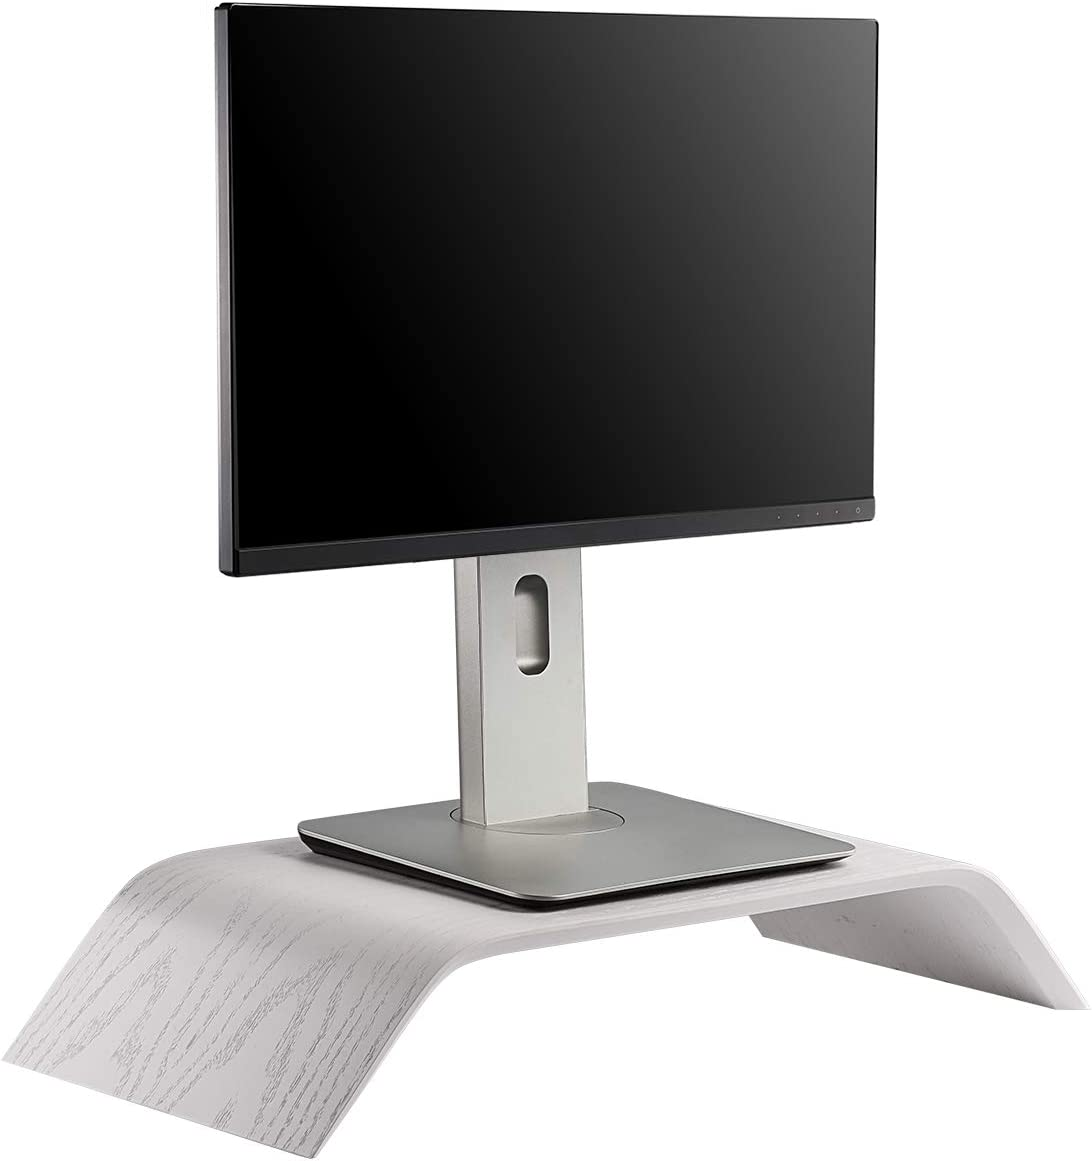 Samdi Wooden Computer Monitor Stand, Desktop Accessories, Laptop Stand, Notebook Stand, for MacBook Stand (Oak Wood White)